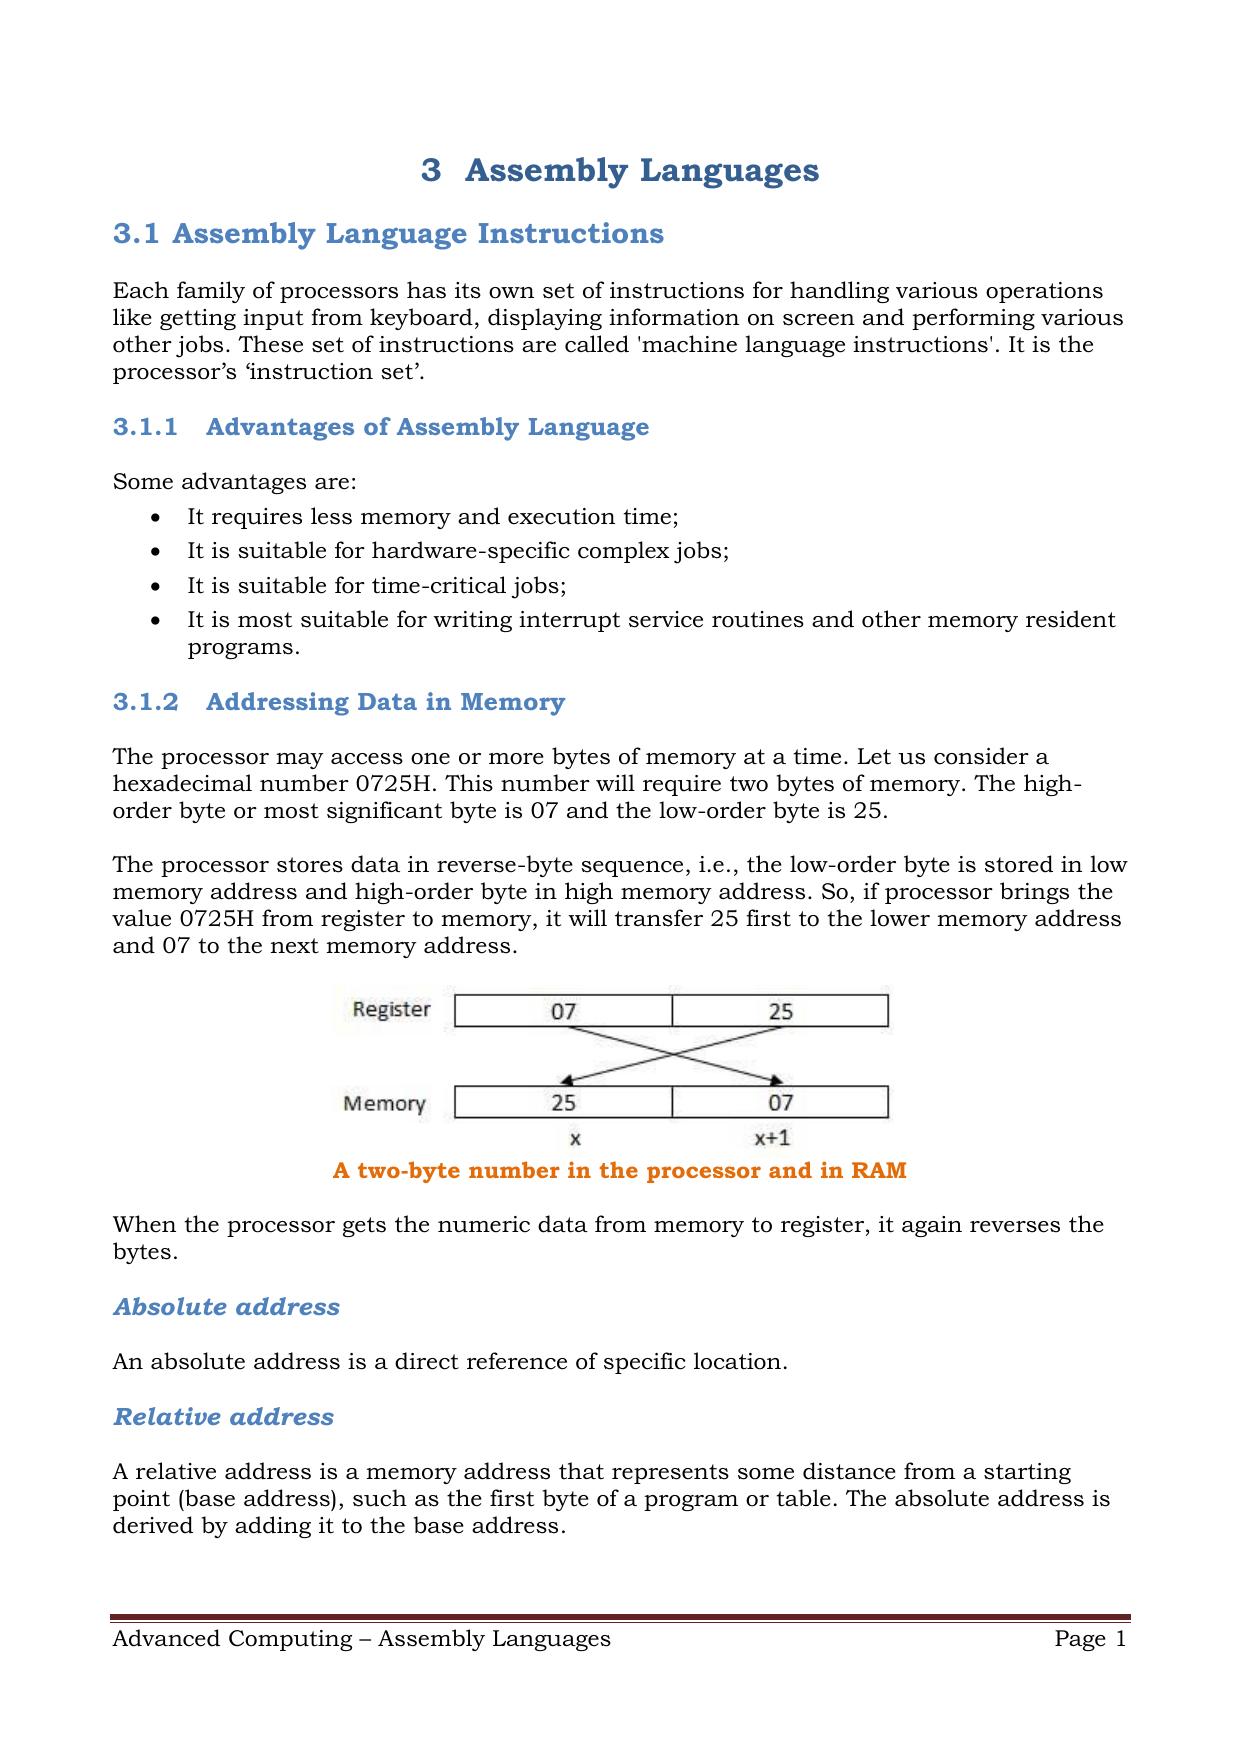 Assembly Languages | manualzz com